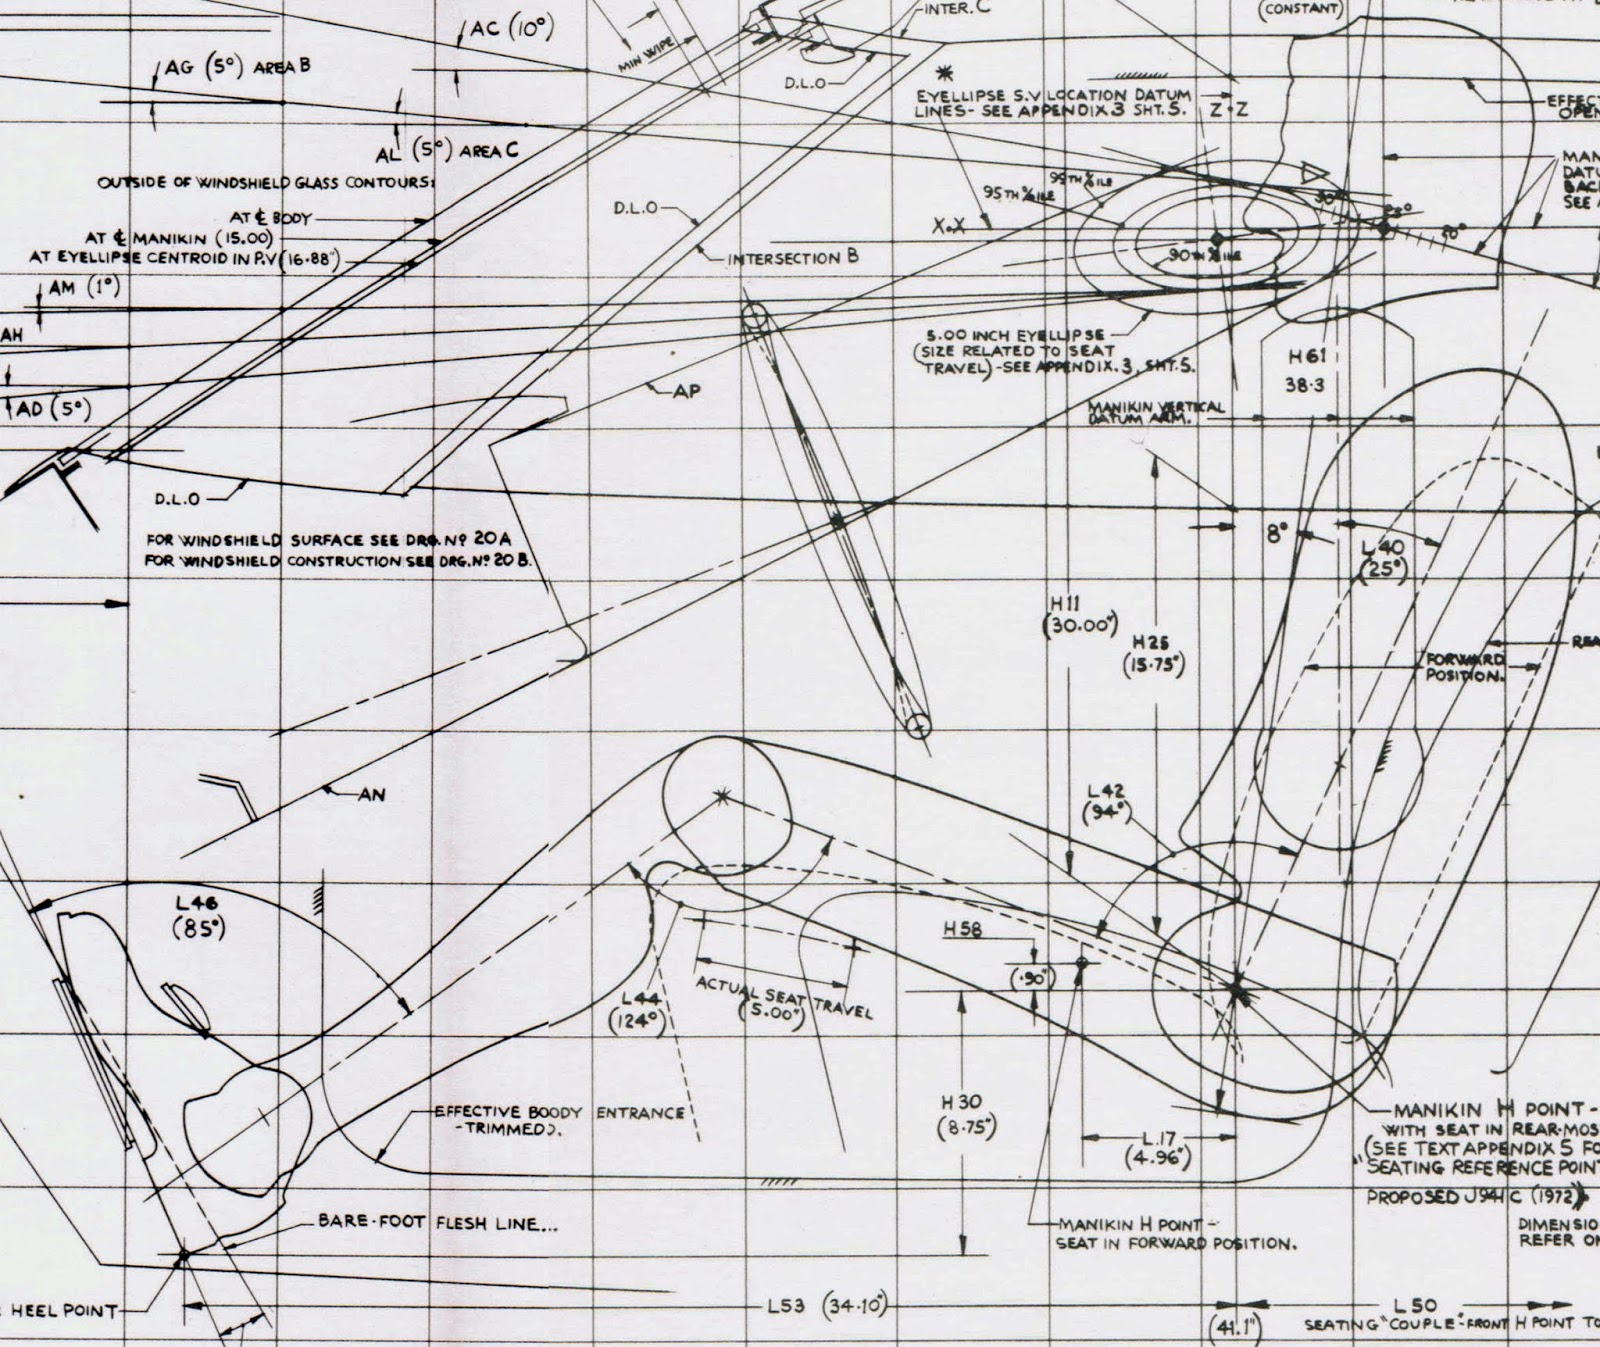 2002 ford windstar serpentine belt diagram 99 tahoe alternator wiring 1998